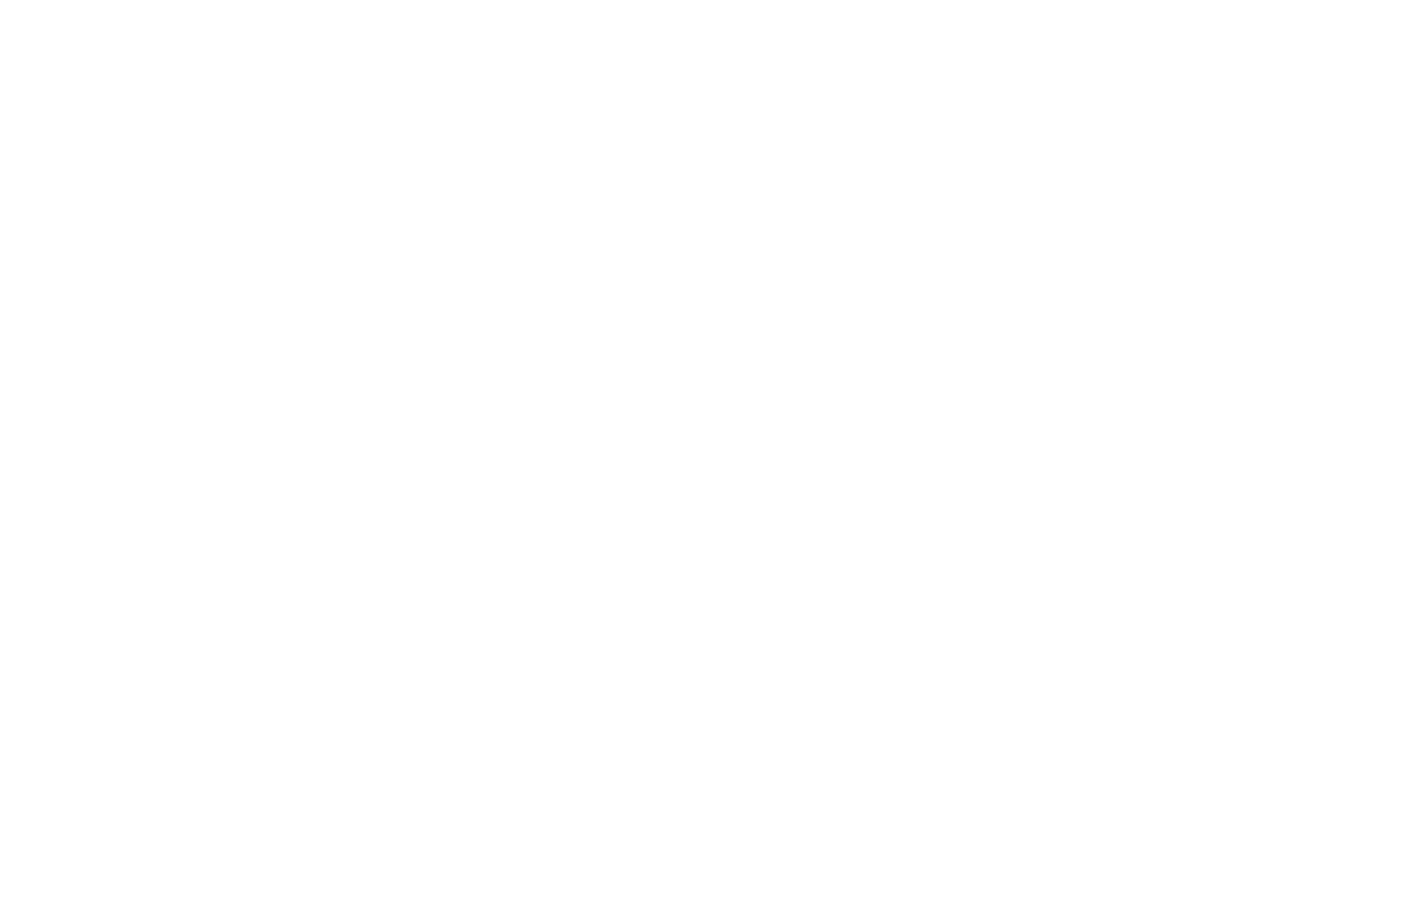 SFI Process diagram